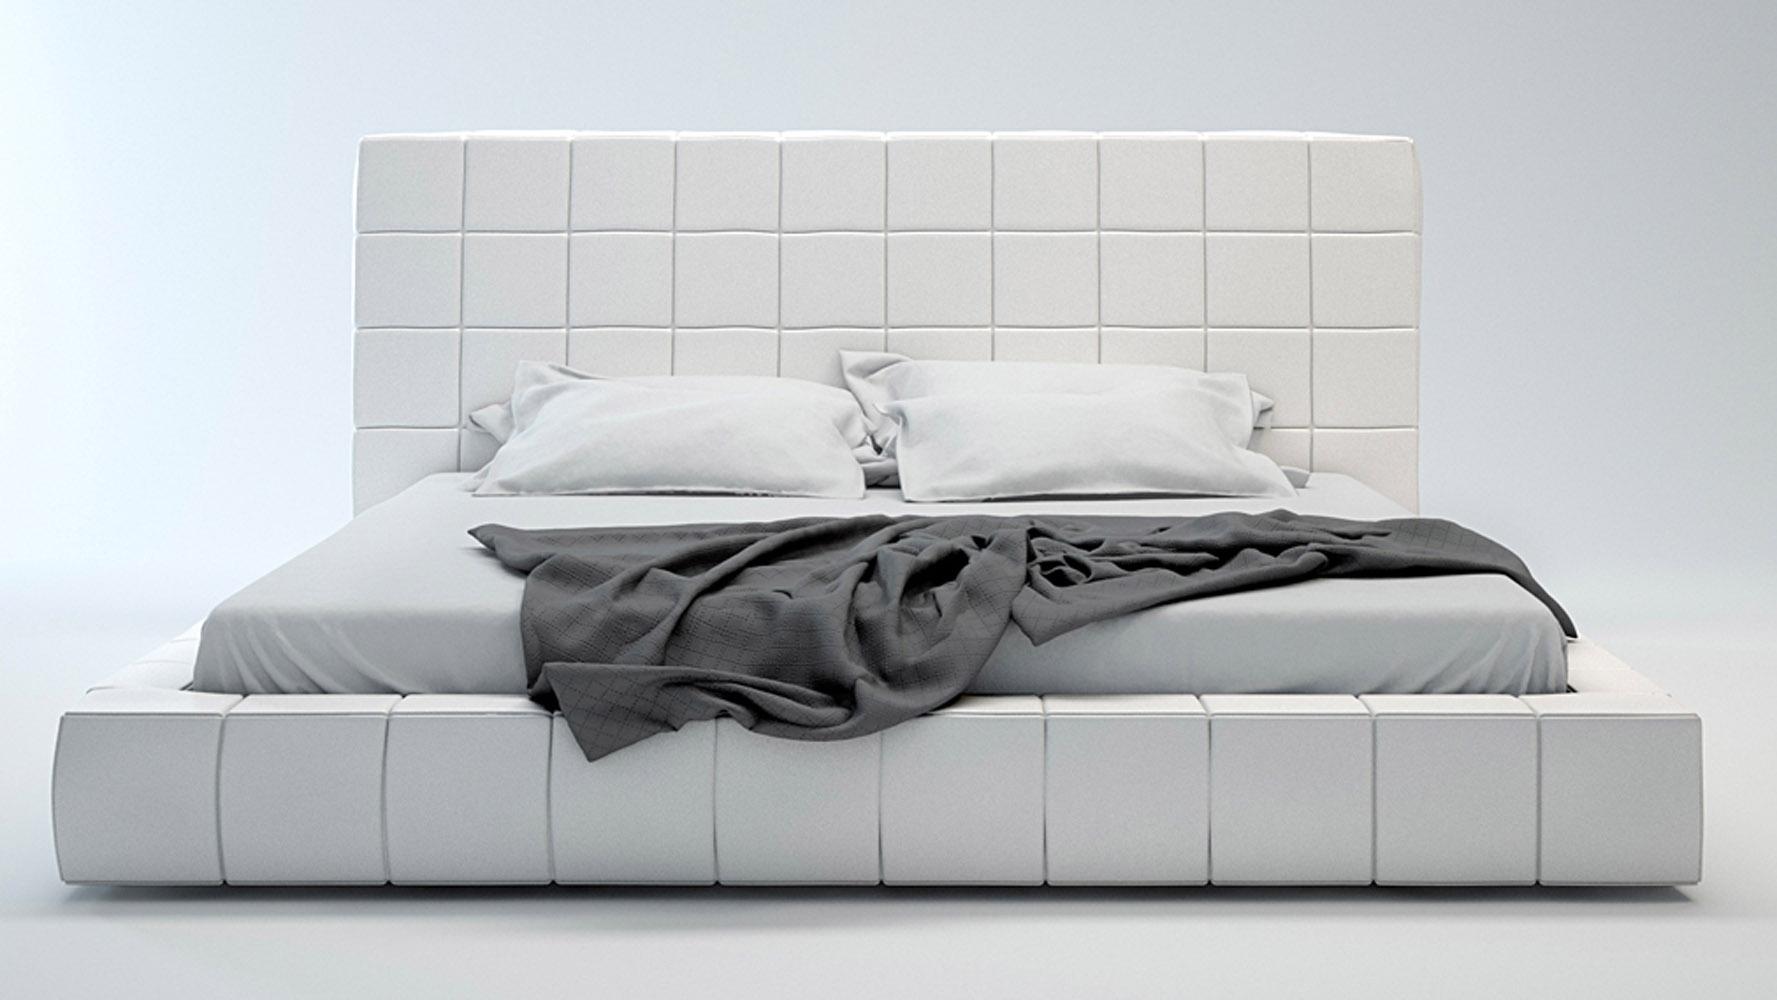 Home / BEDROOM / Beds / Verona Bed - White